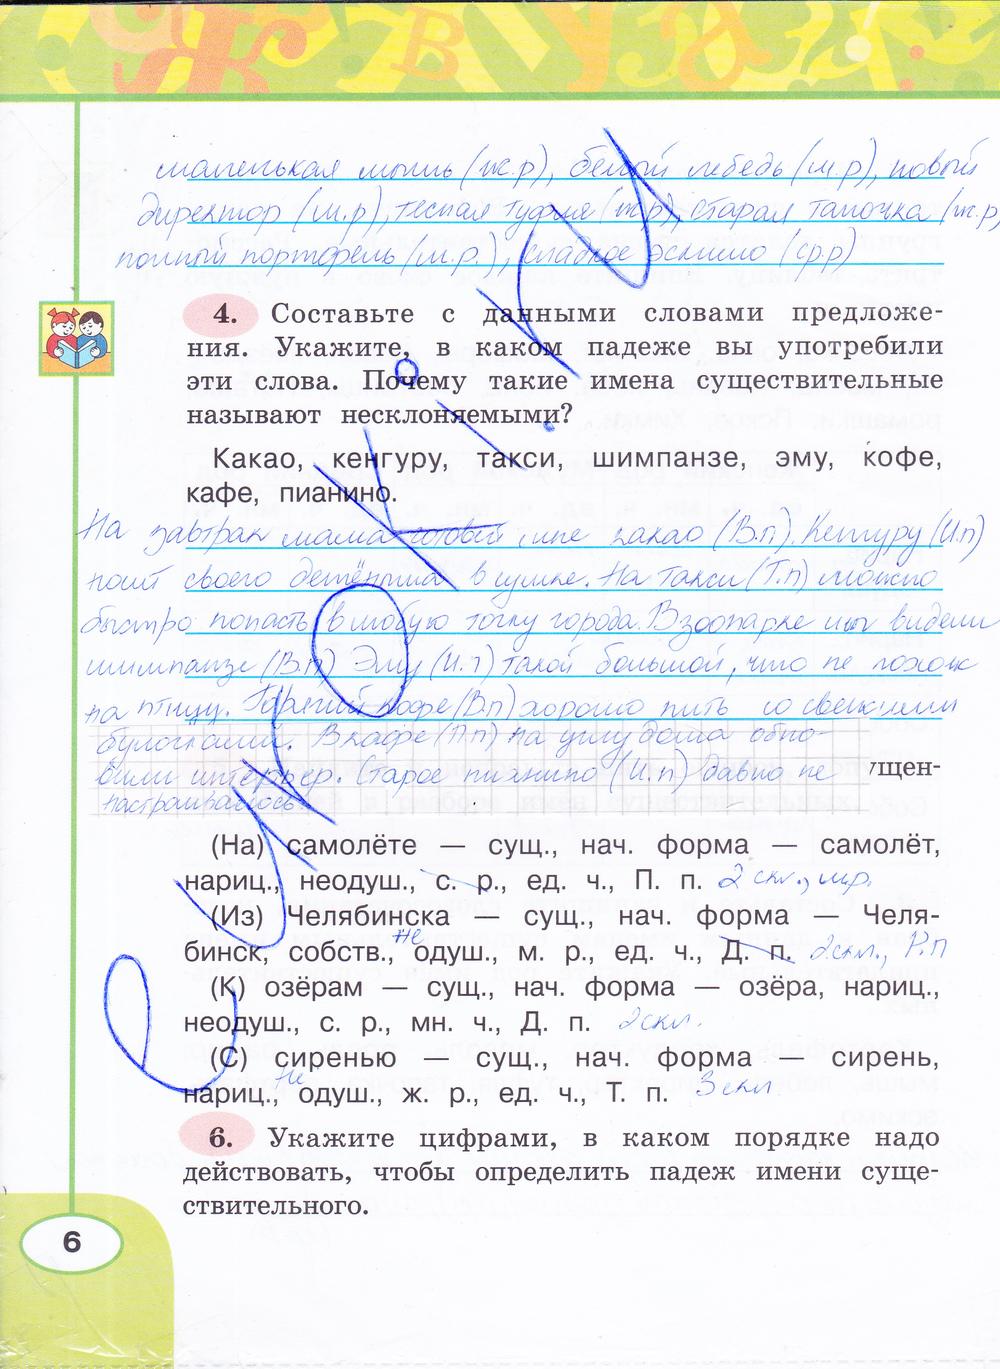 Гдз по русскому языку рабочая тетрадь 4 класс климанова, бабушкин.